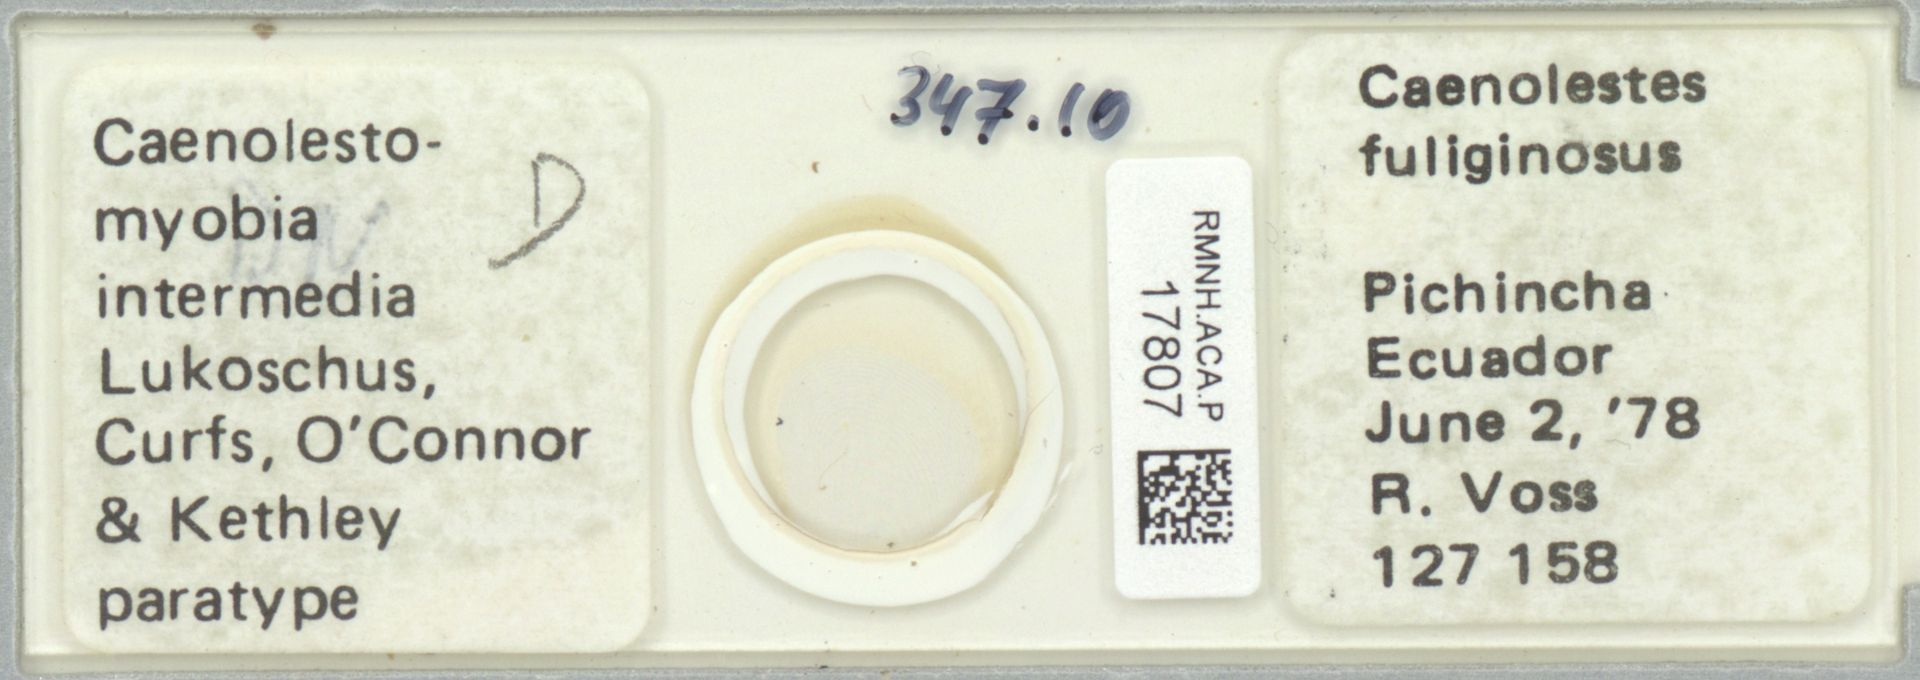 RMNH.ACA.P.17807   Caenolestomyobia intermedia